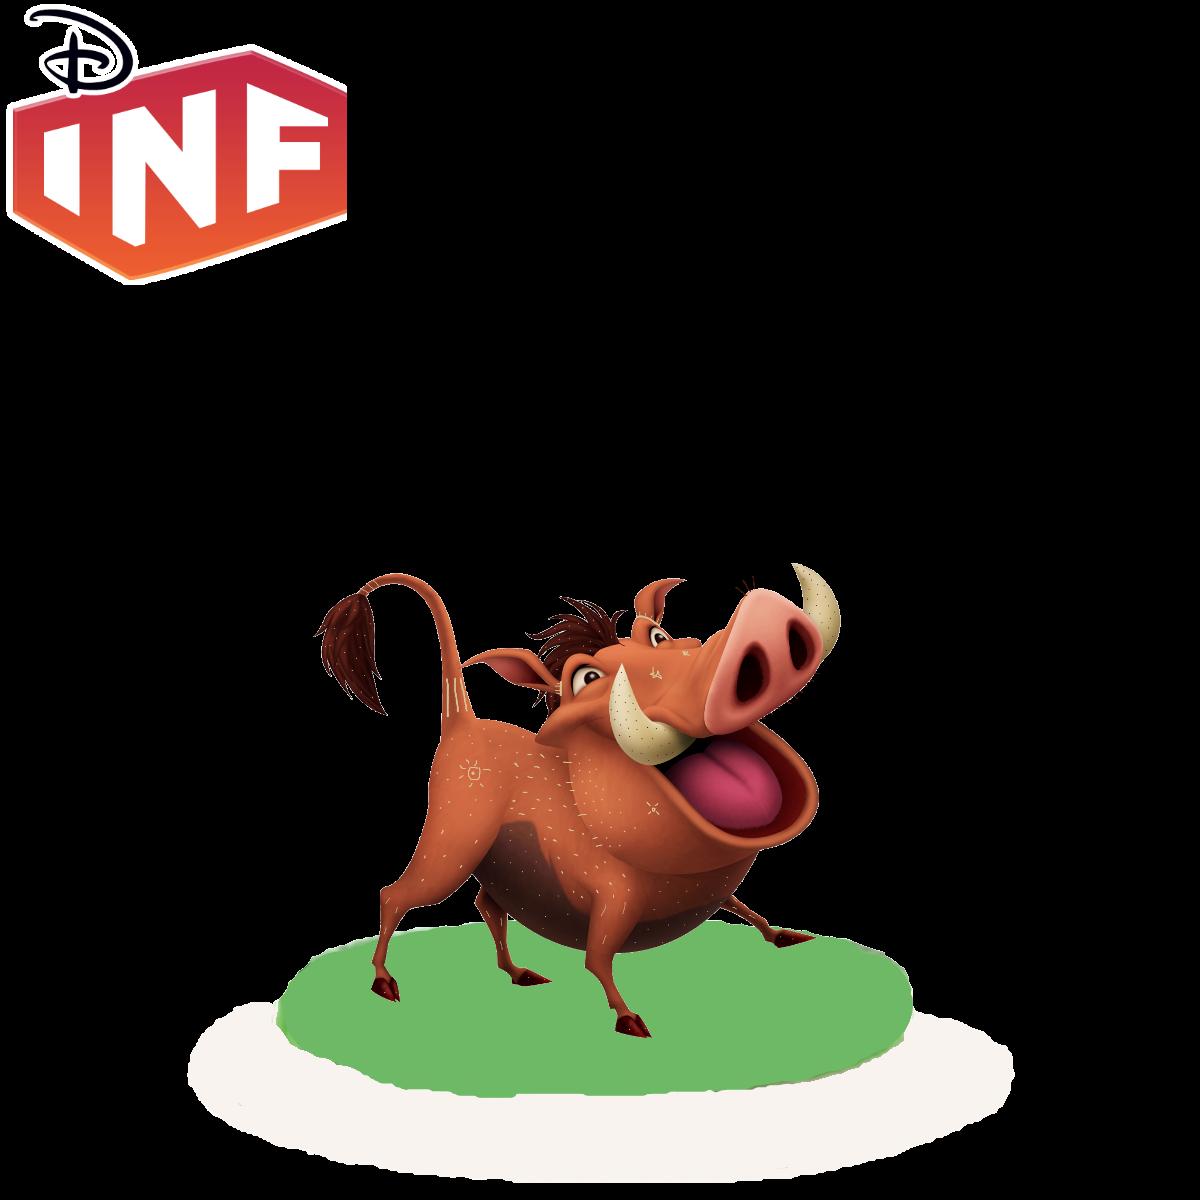 disney infinity lion king - photo #22